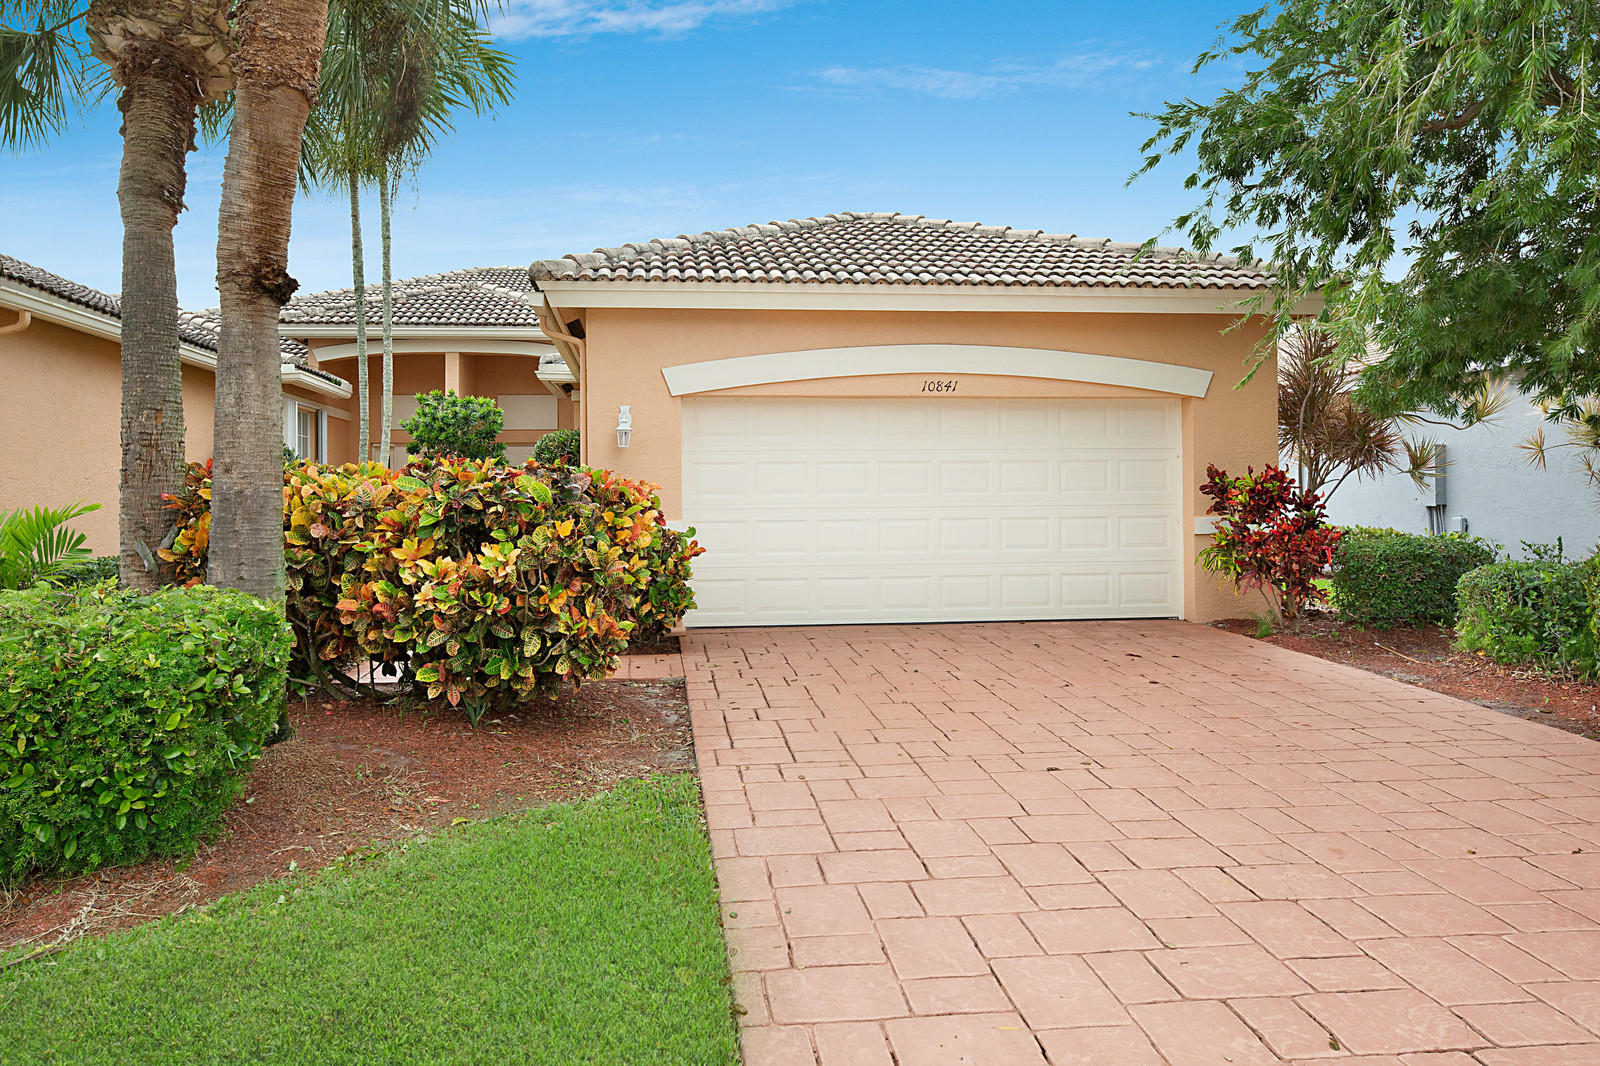 10841 Royal Caribbean Circle Boynton Beach, FL 33437